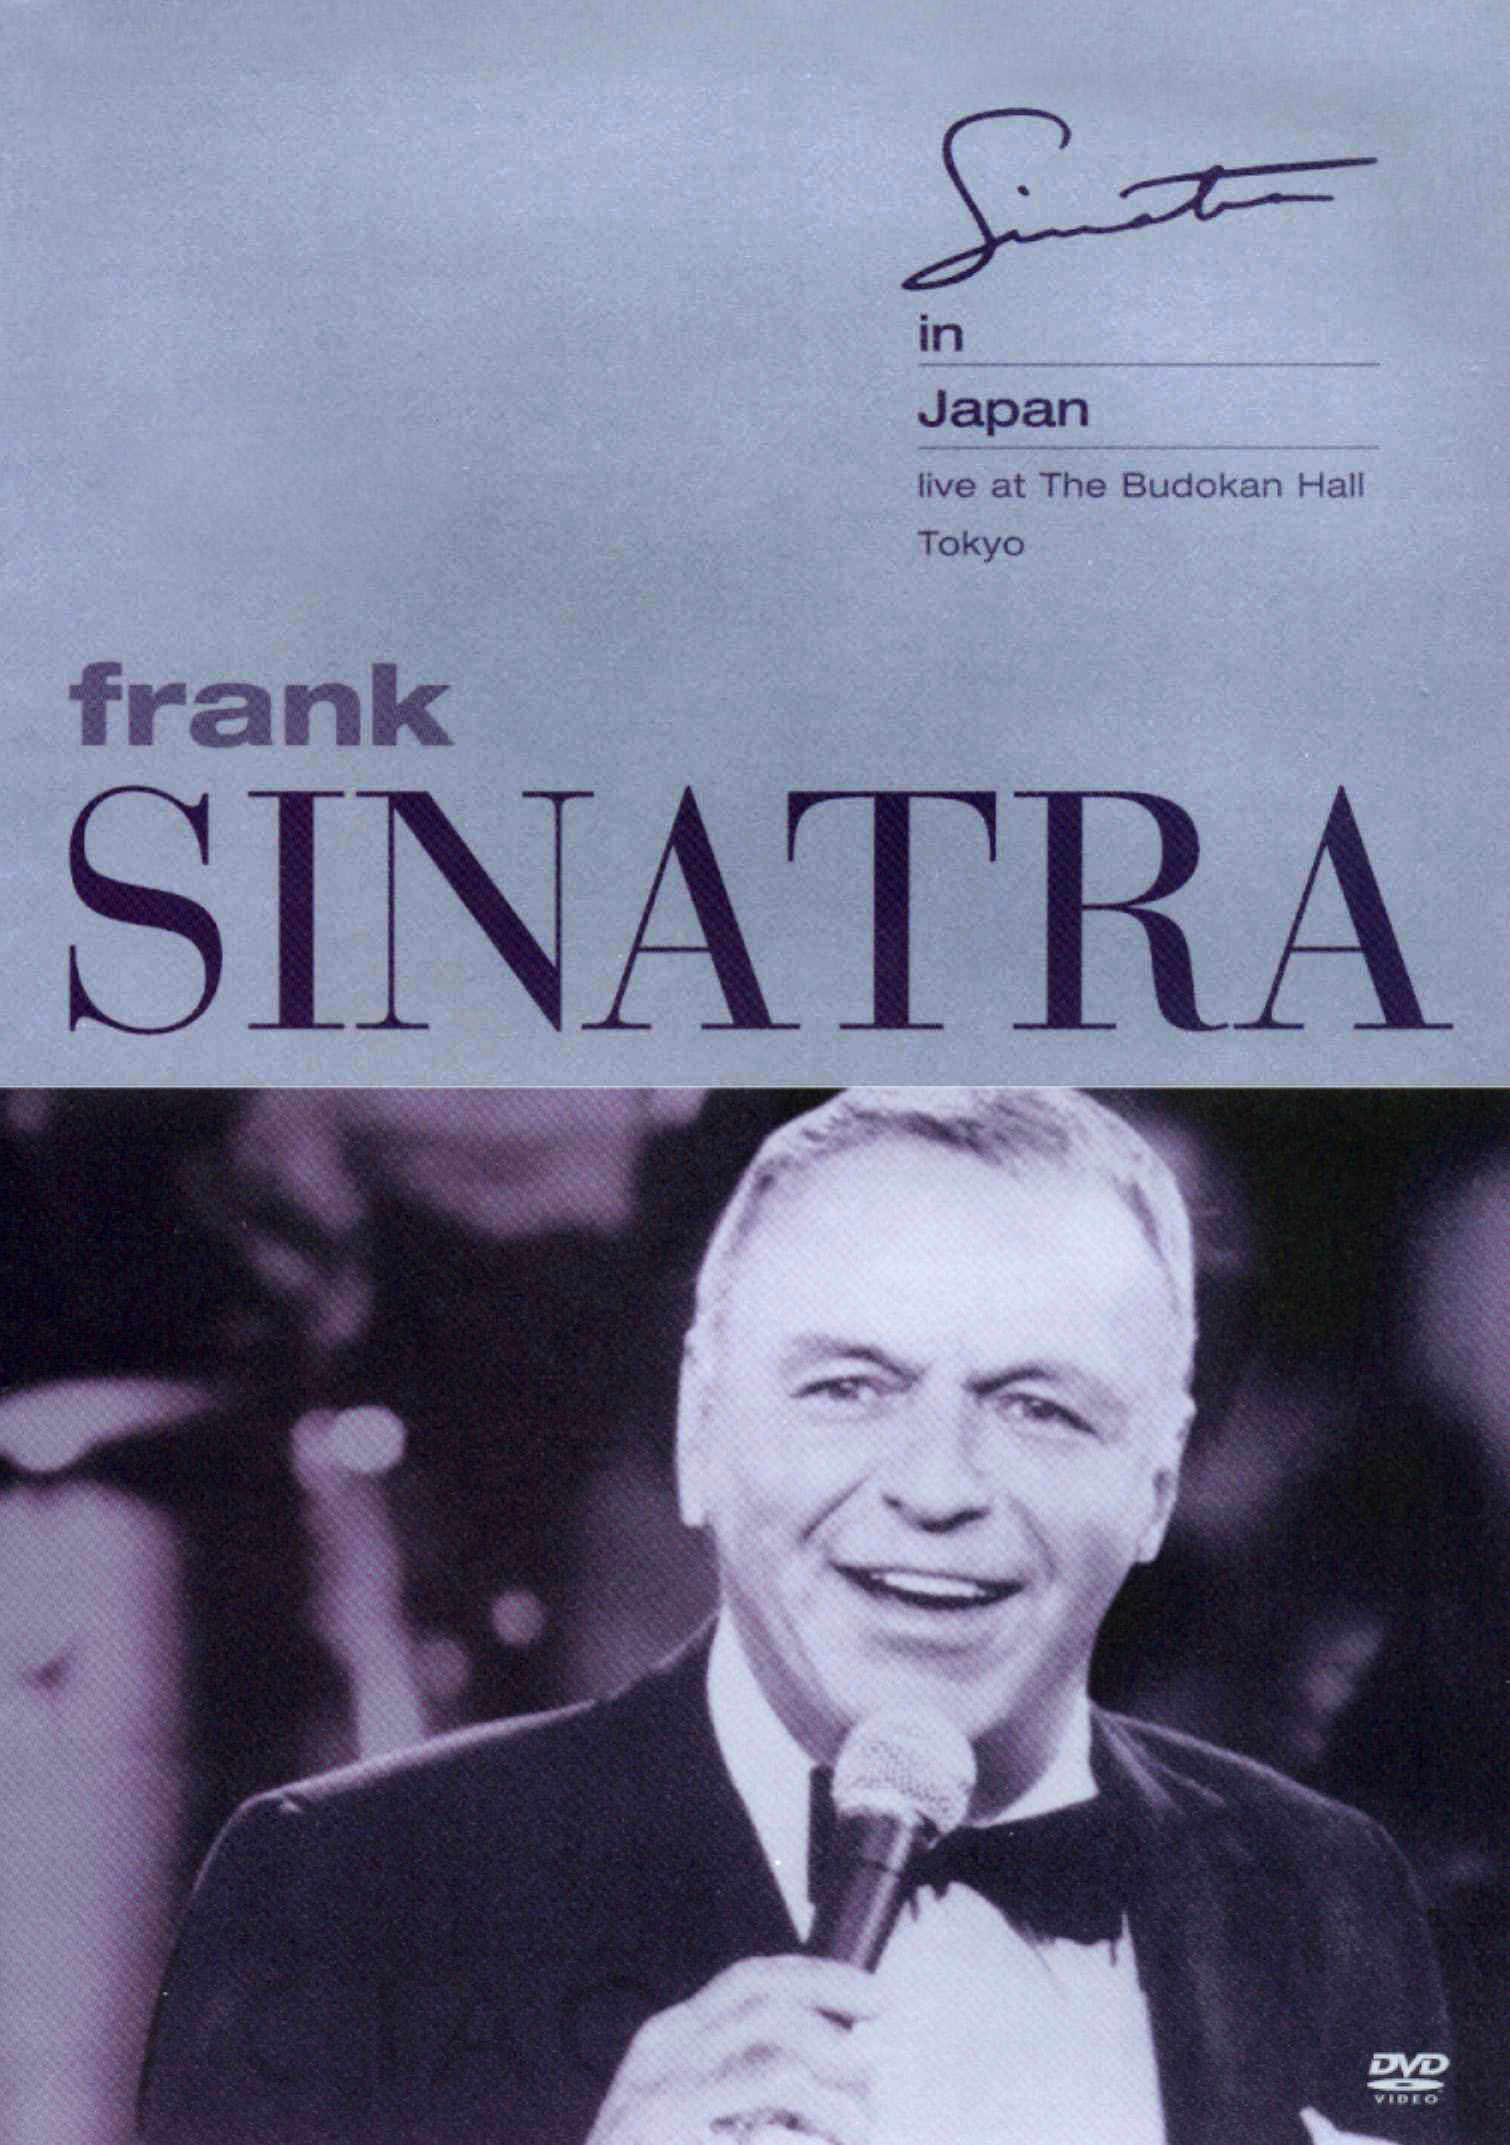 Frank Sinatra: In Japan - Live at The Budokan Hall, Tokyo